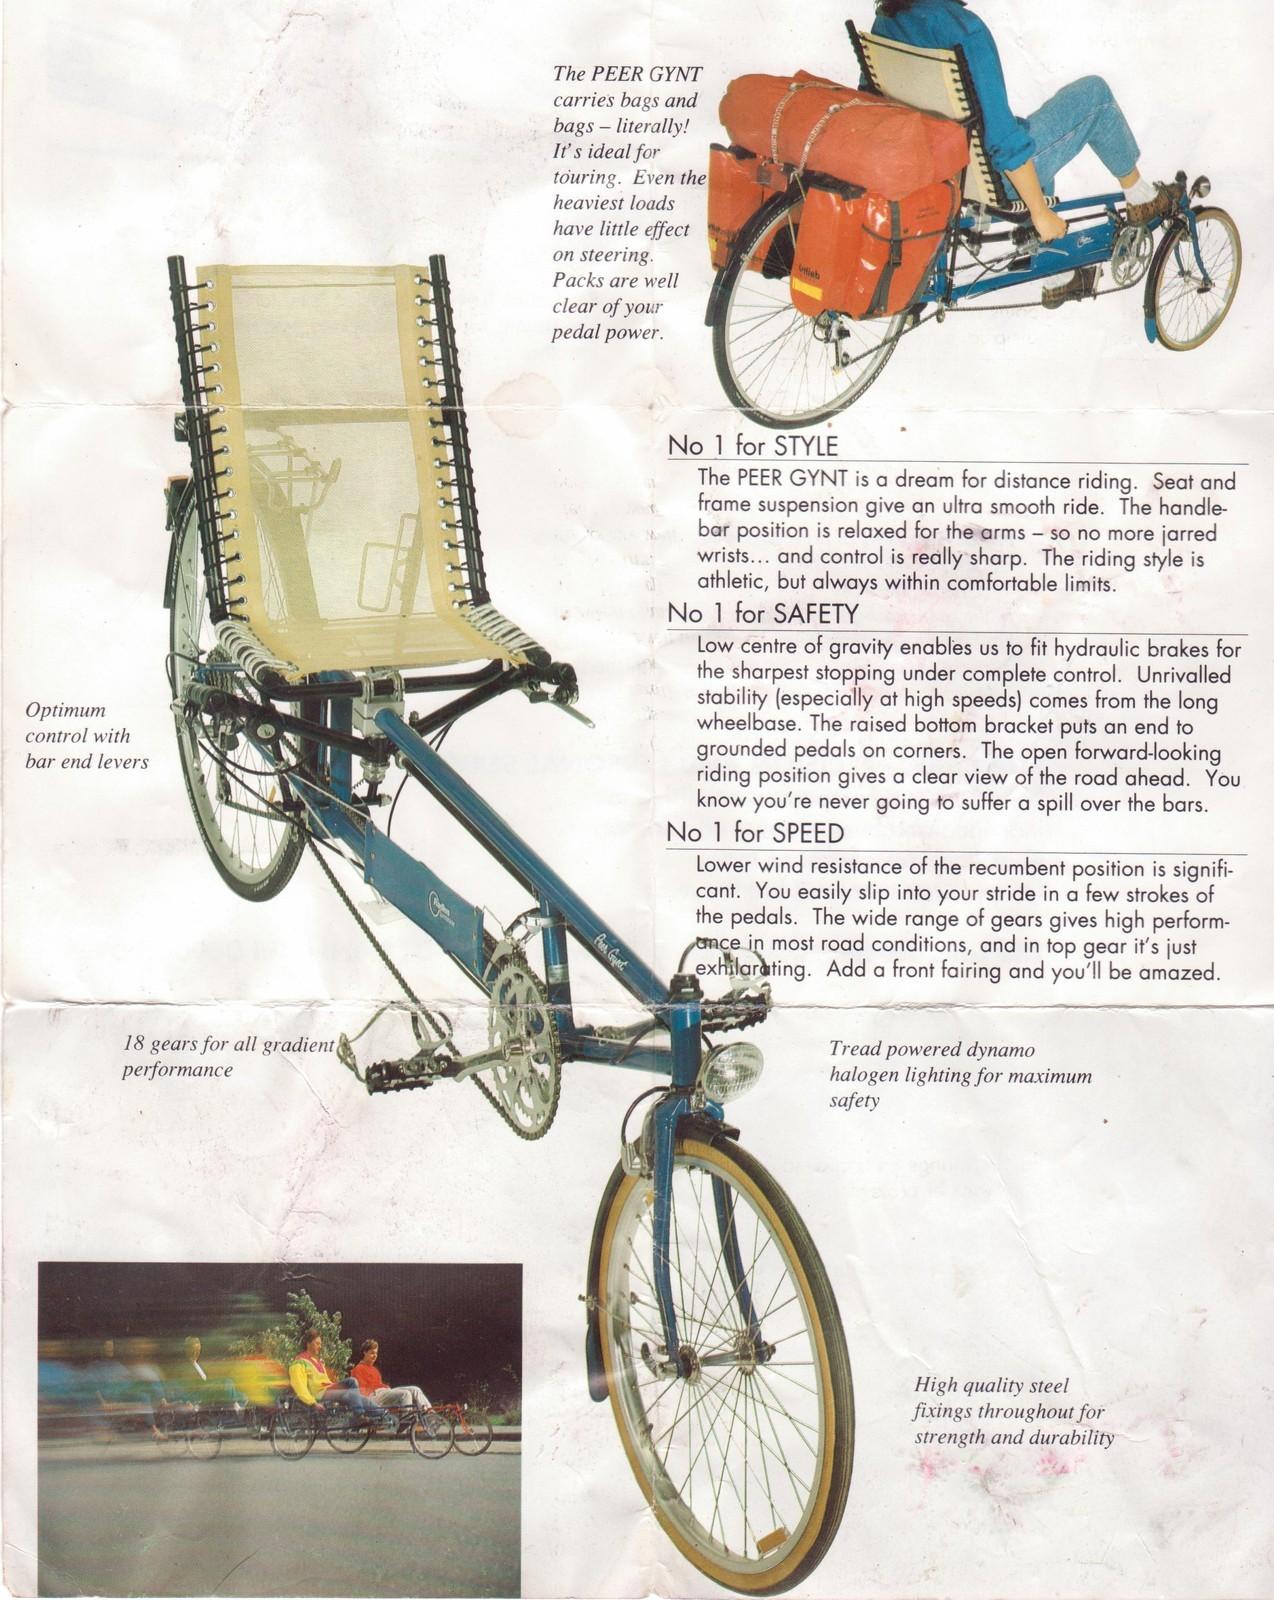 radius spezialräder münster peer gynt 33-632-26-eur-01-ao-t-2012-426cd7a